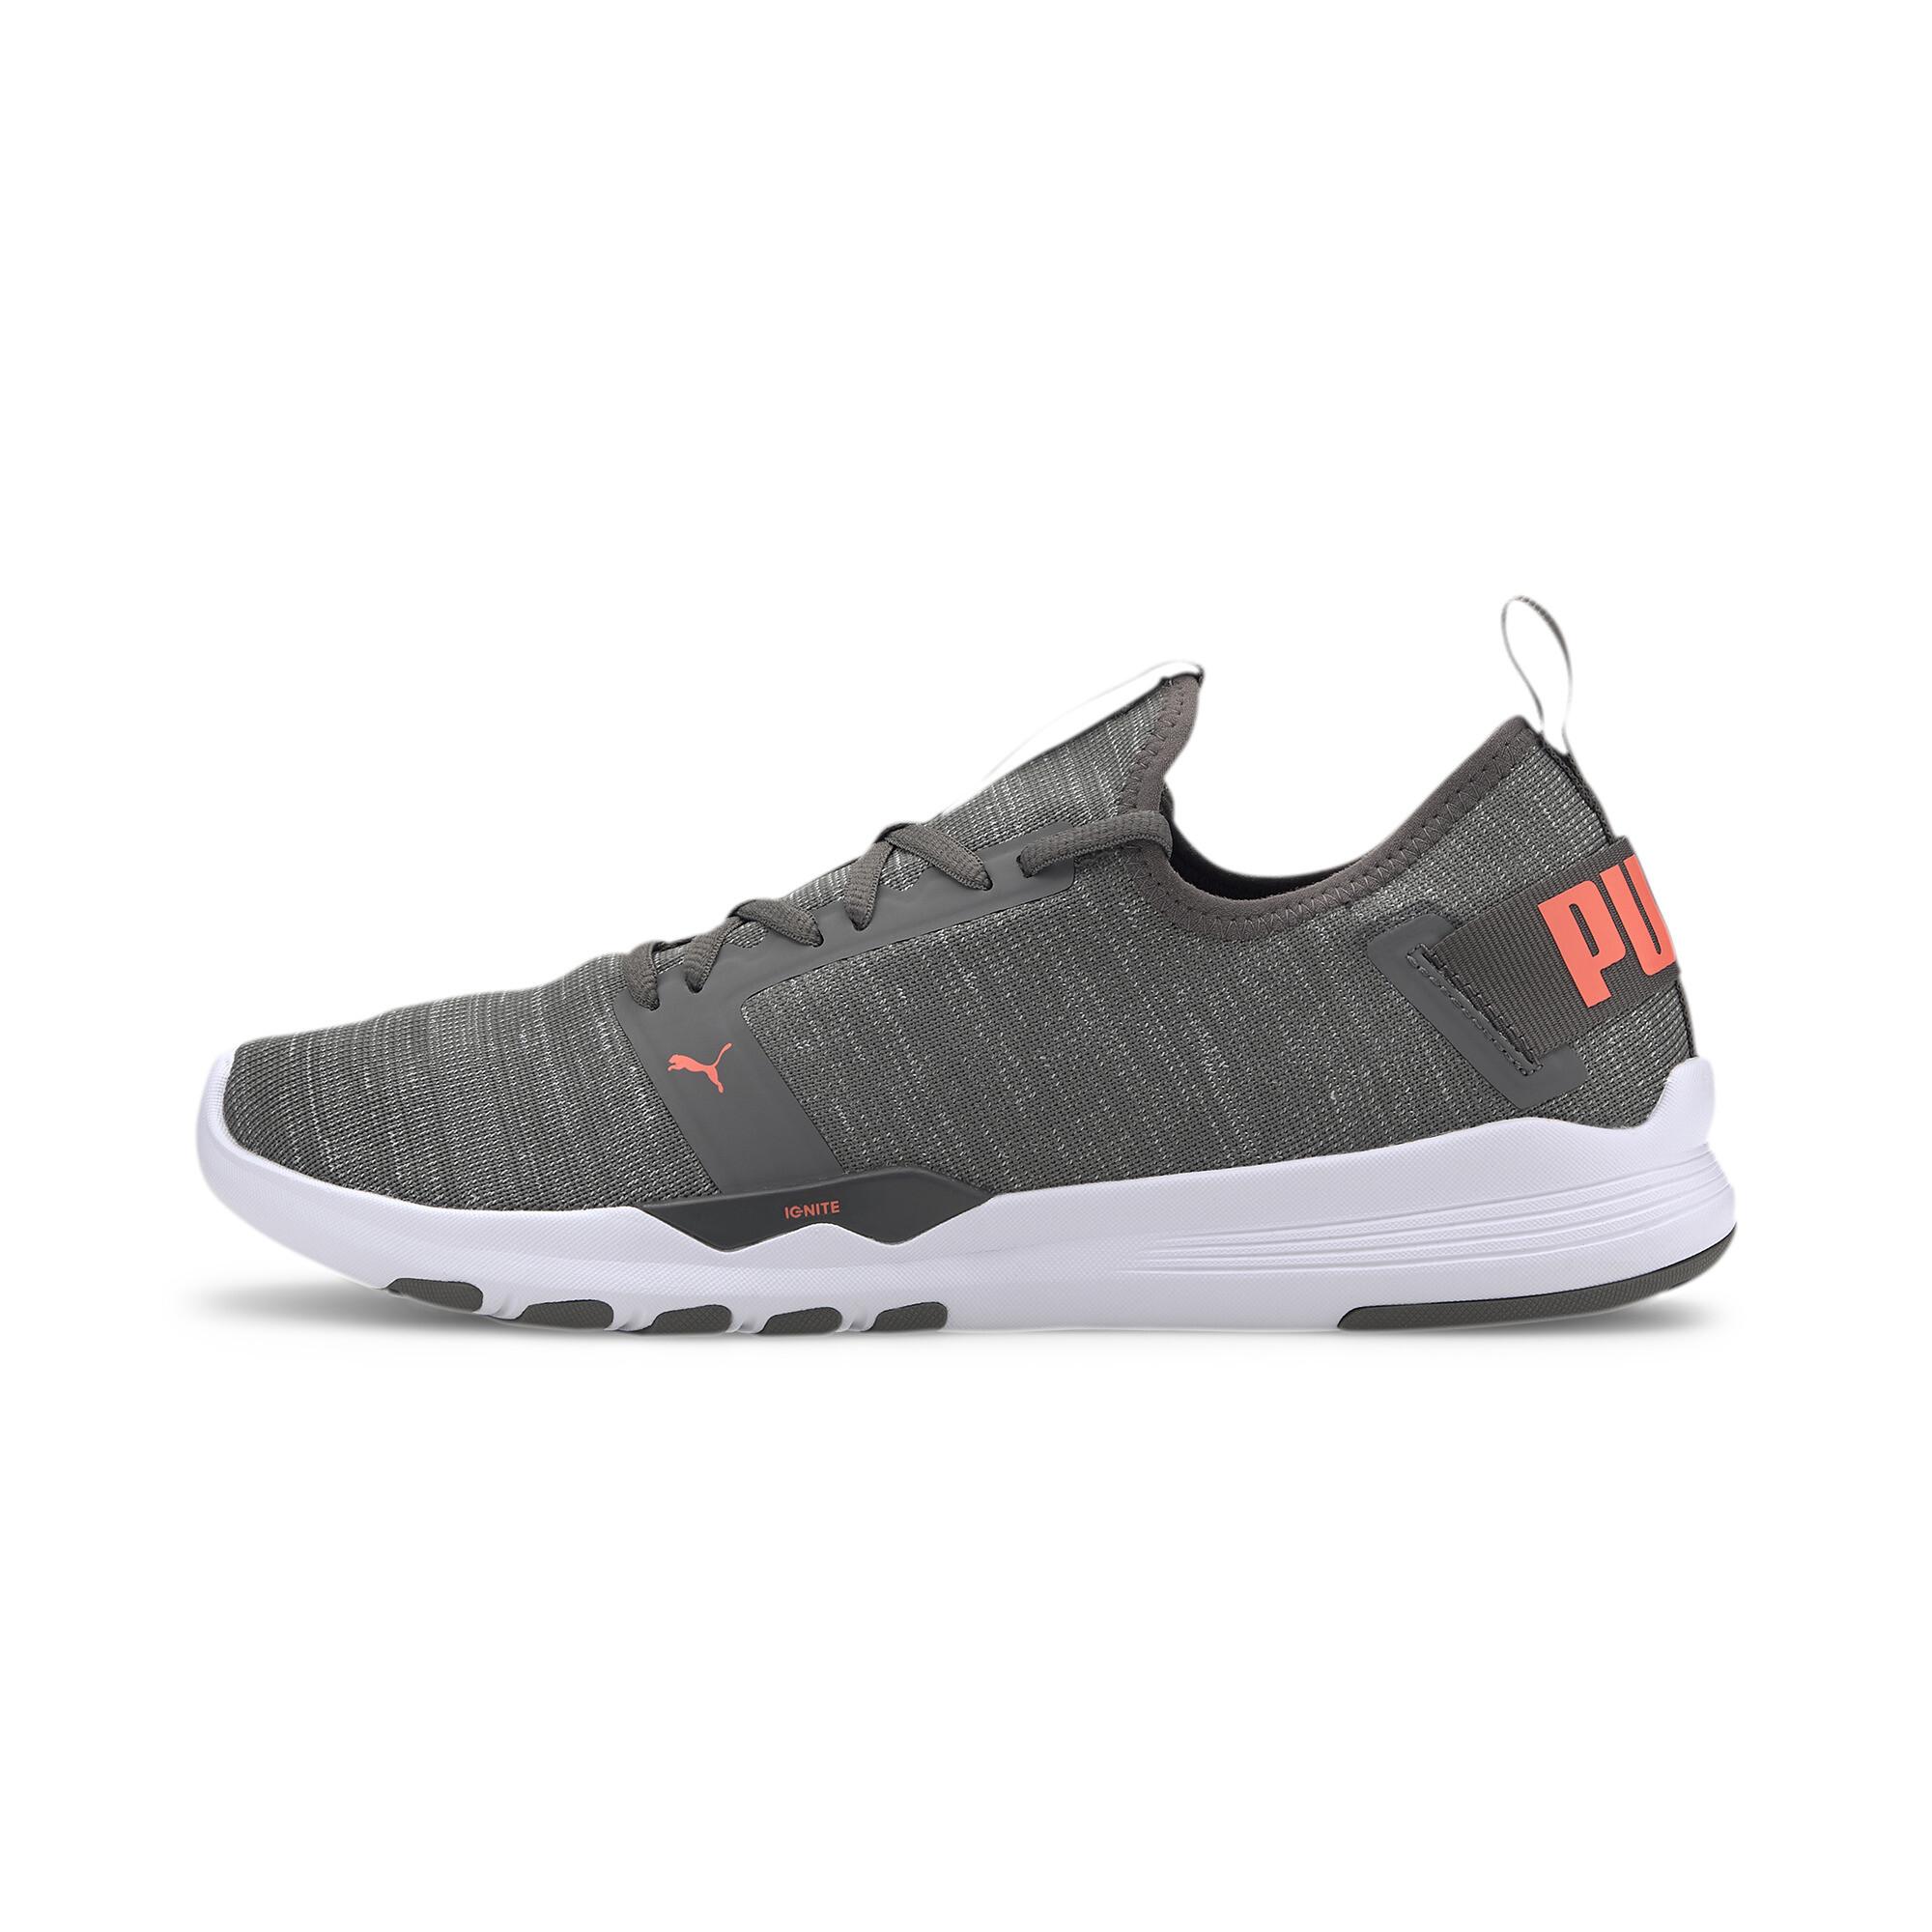 PUMA-Men-039-s-IGNITE-Contender-Knit-Running-Shoes thumbnail 4